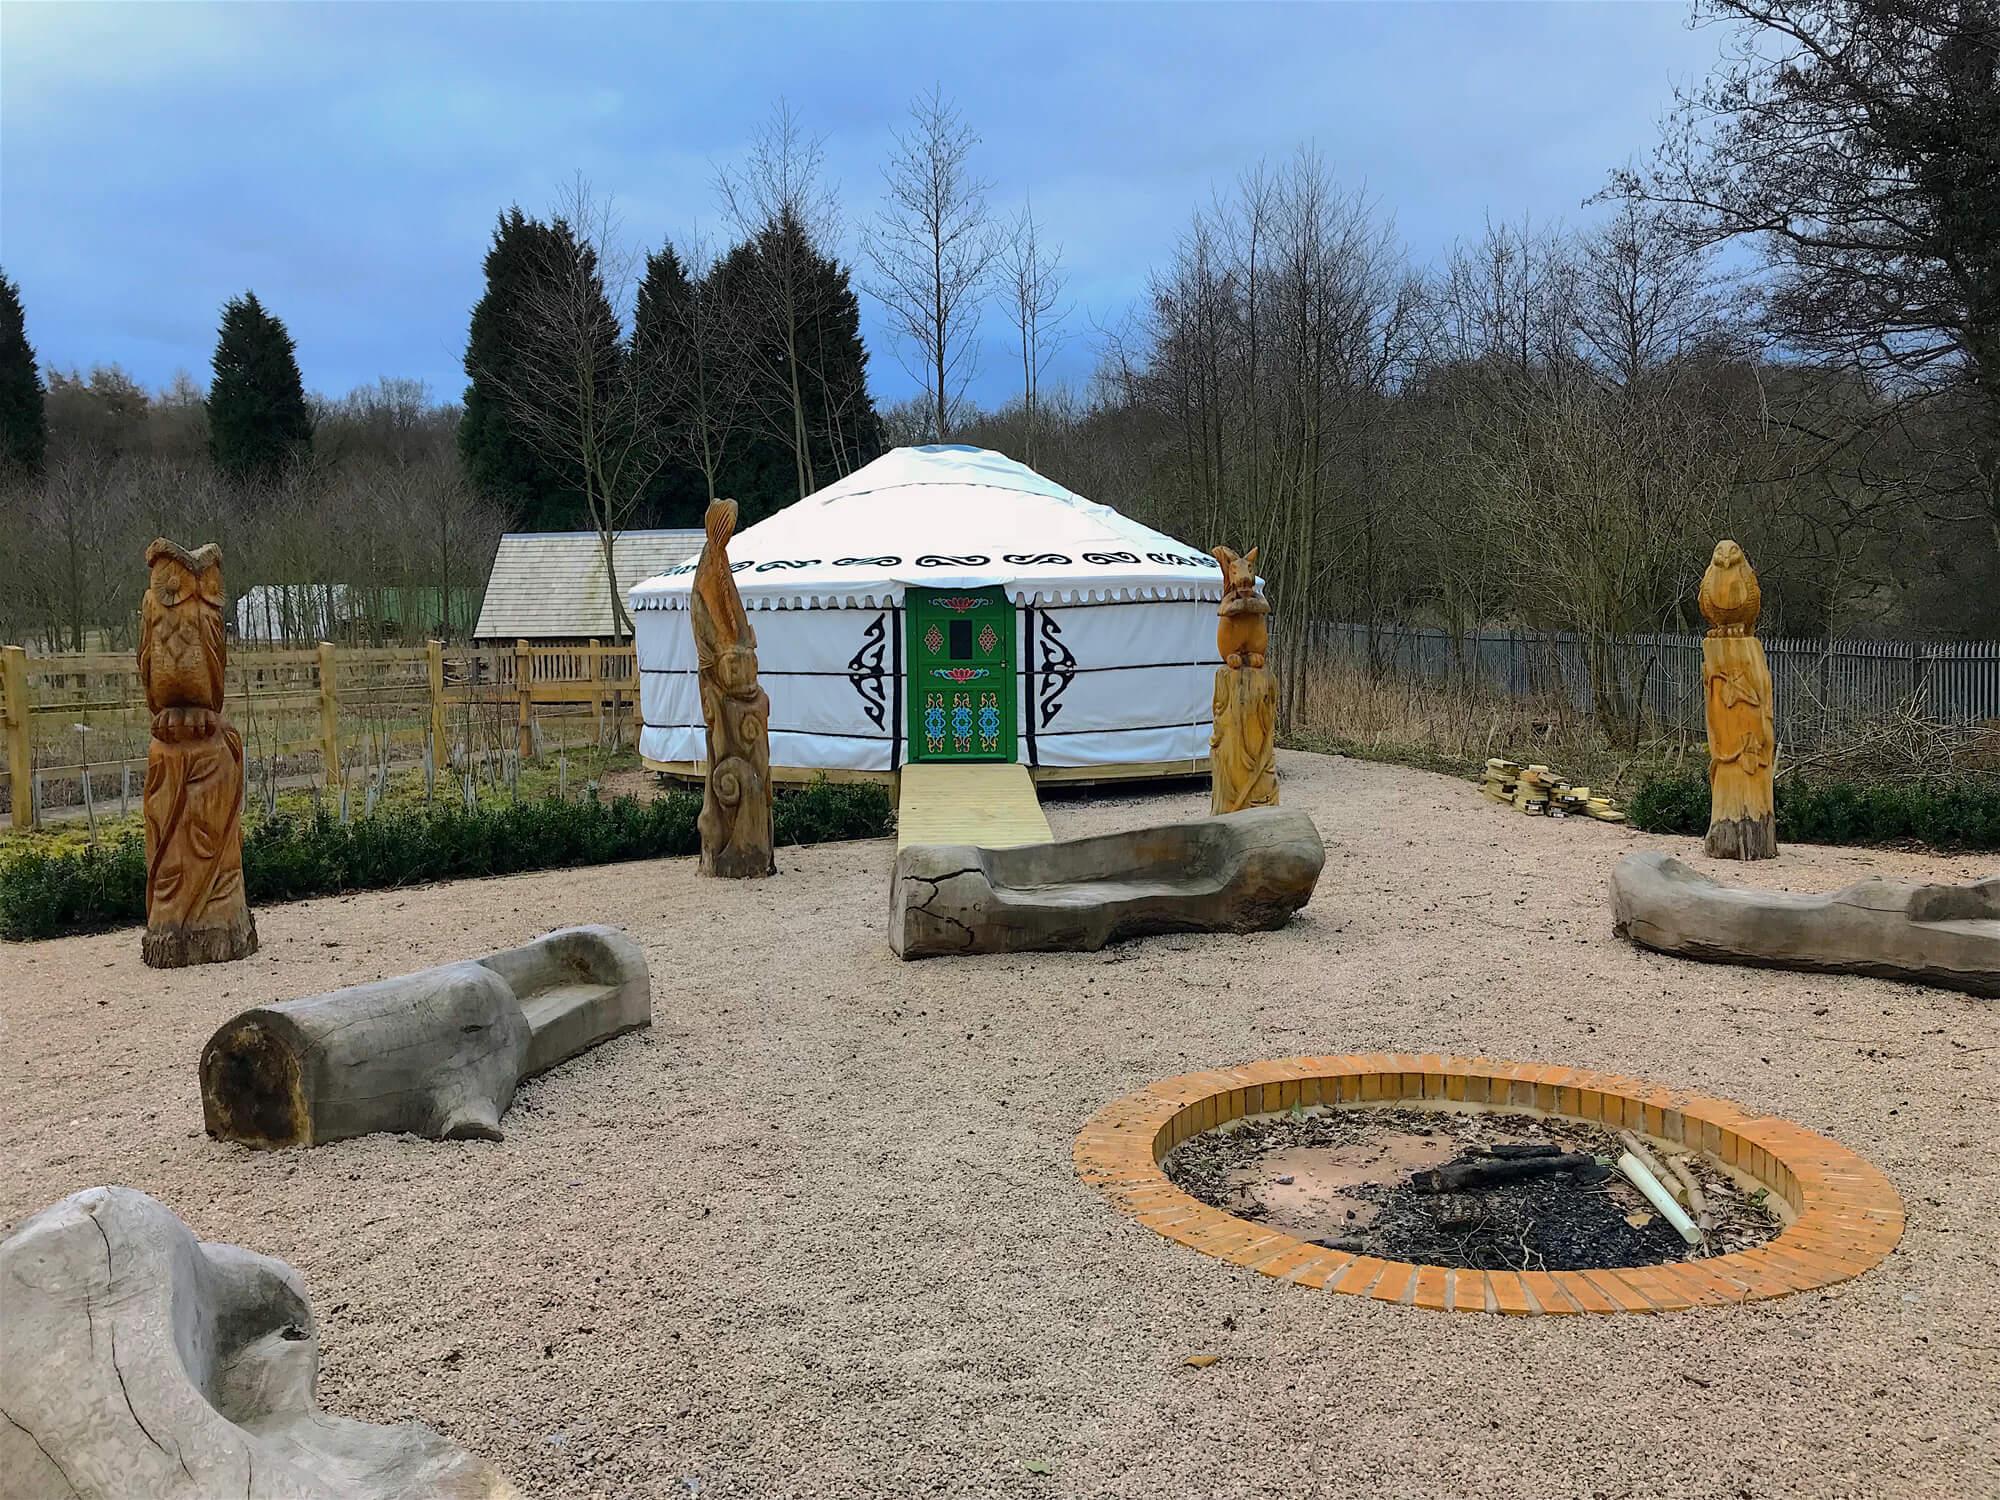 School Playground Sensory, Imaginative and Creative Play